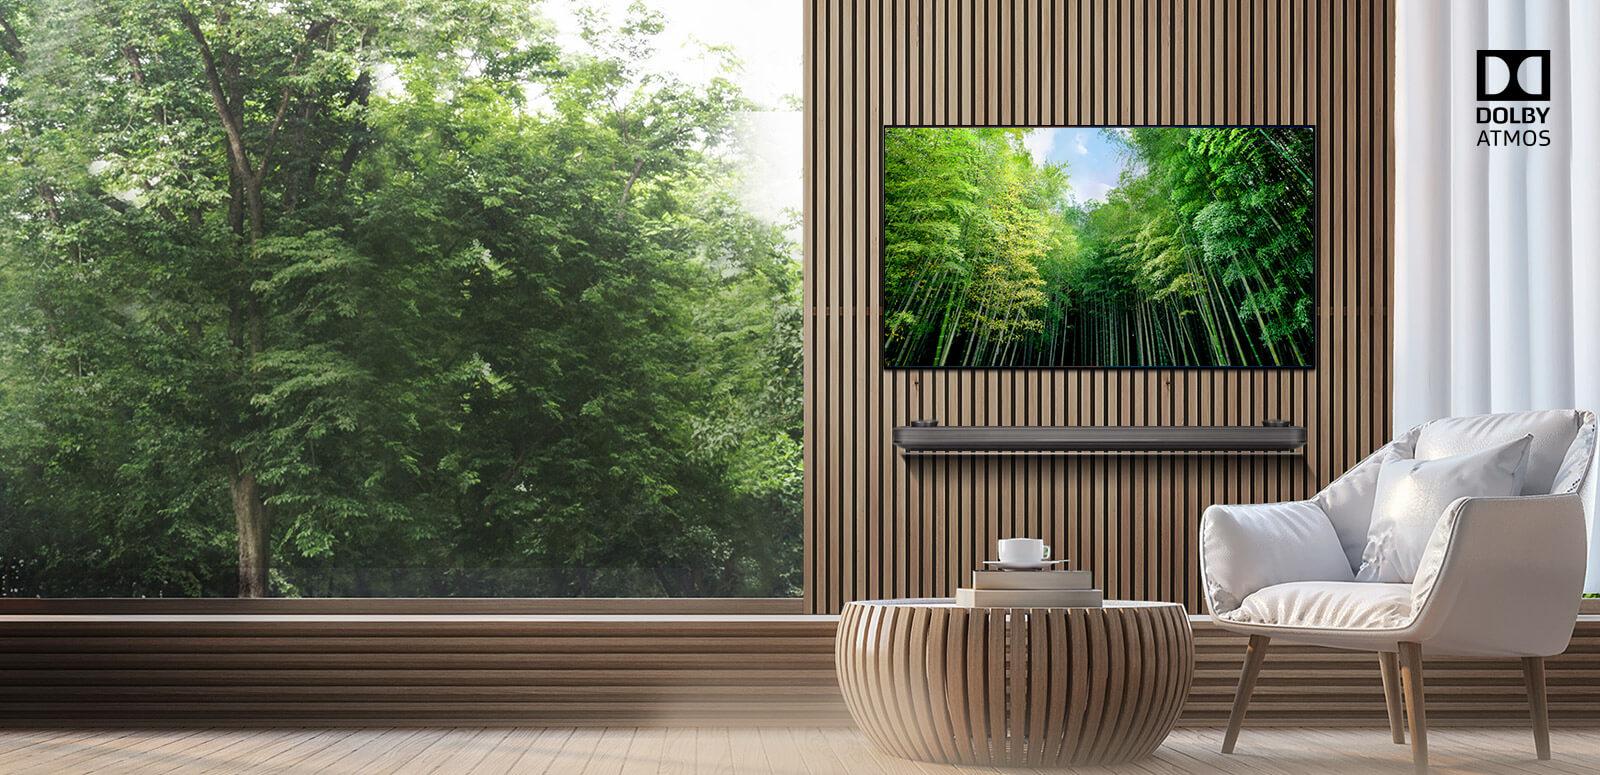 LG OLED mit Dolby Atmos®